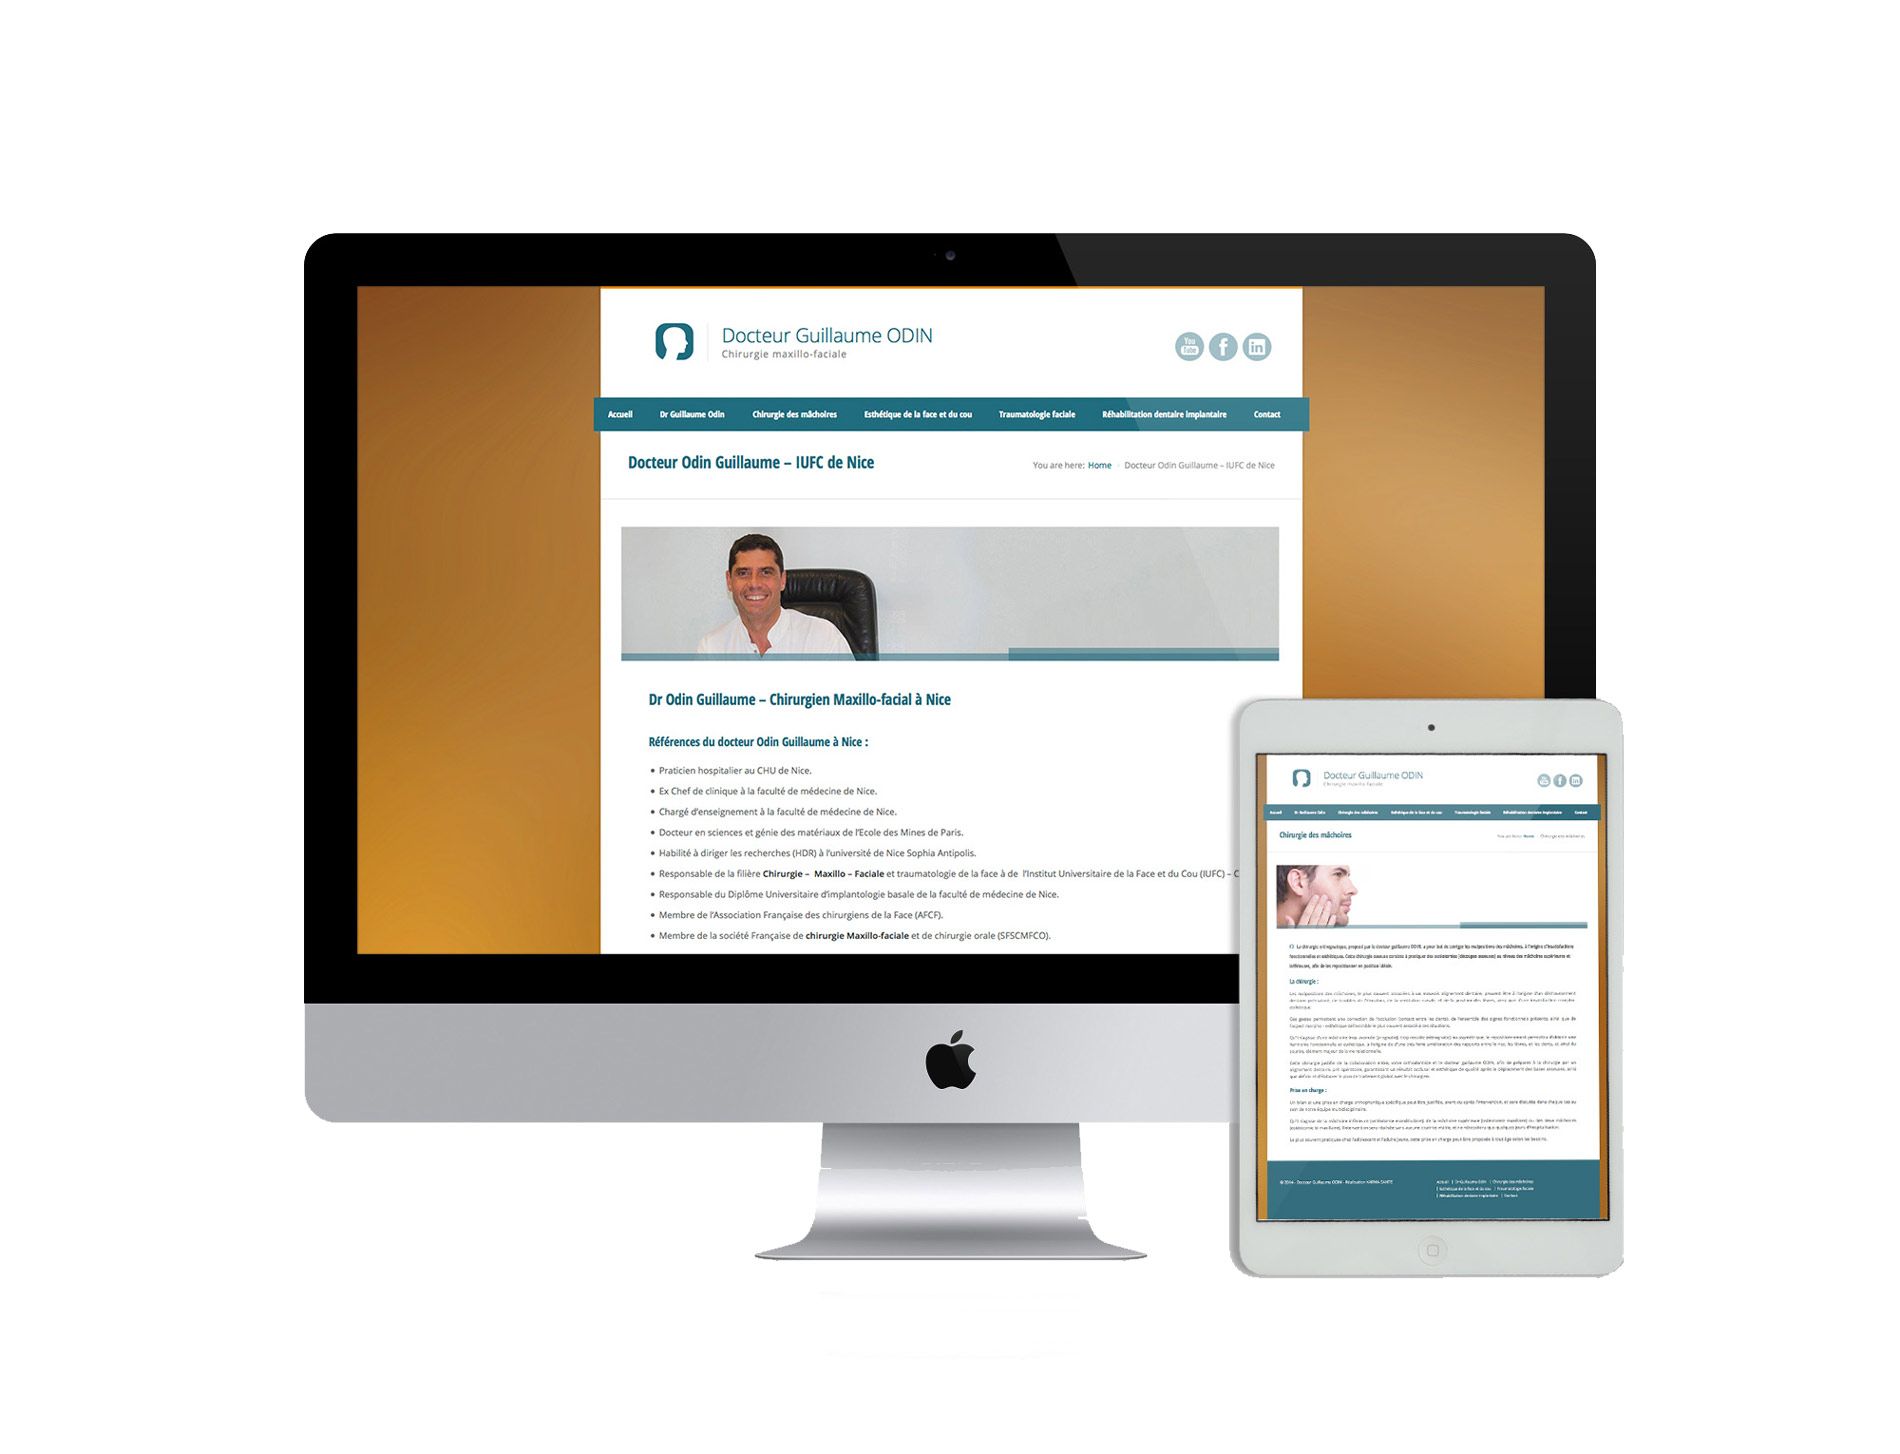 web-Mockup-docteur-odin-agence-karma-sante-communication-nice-paris